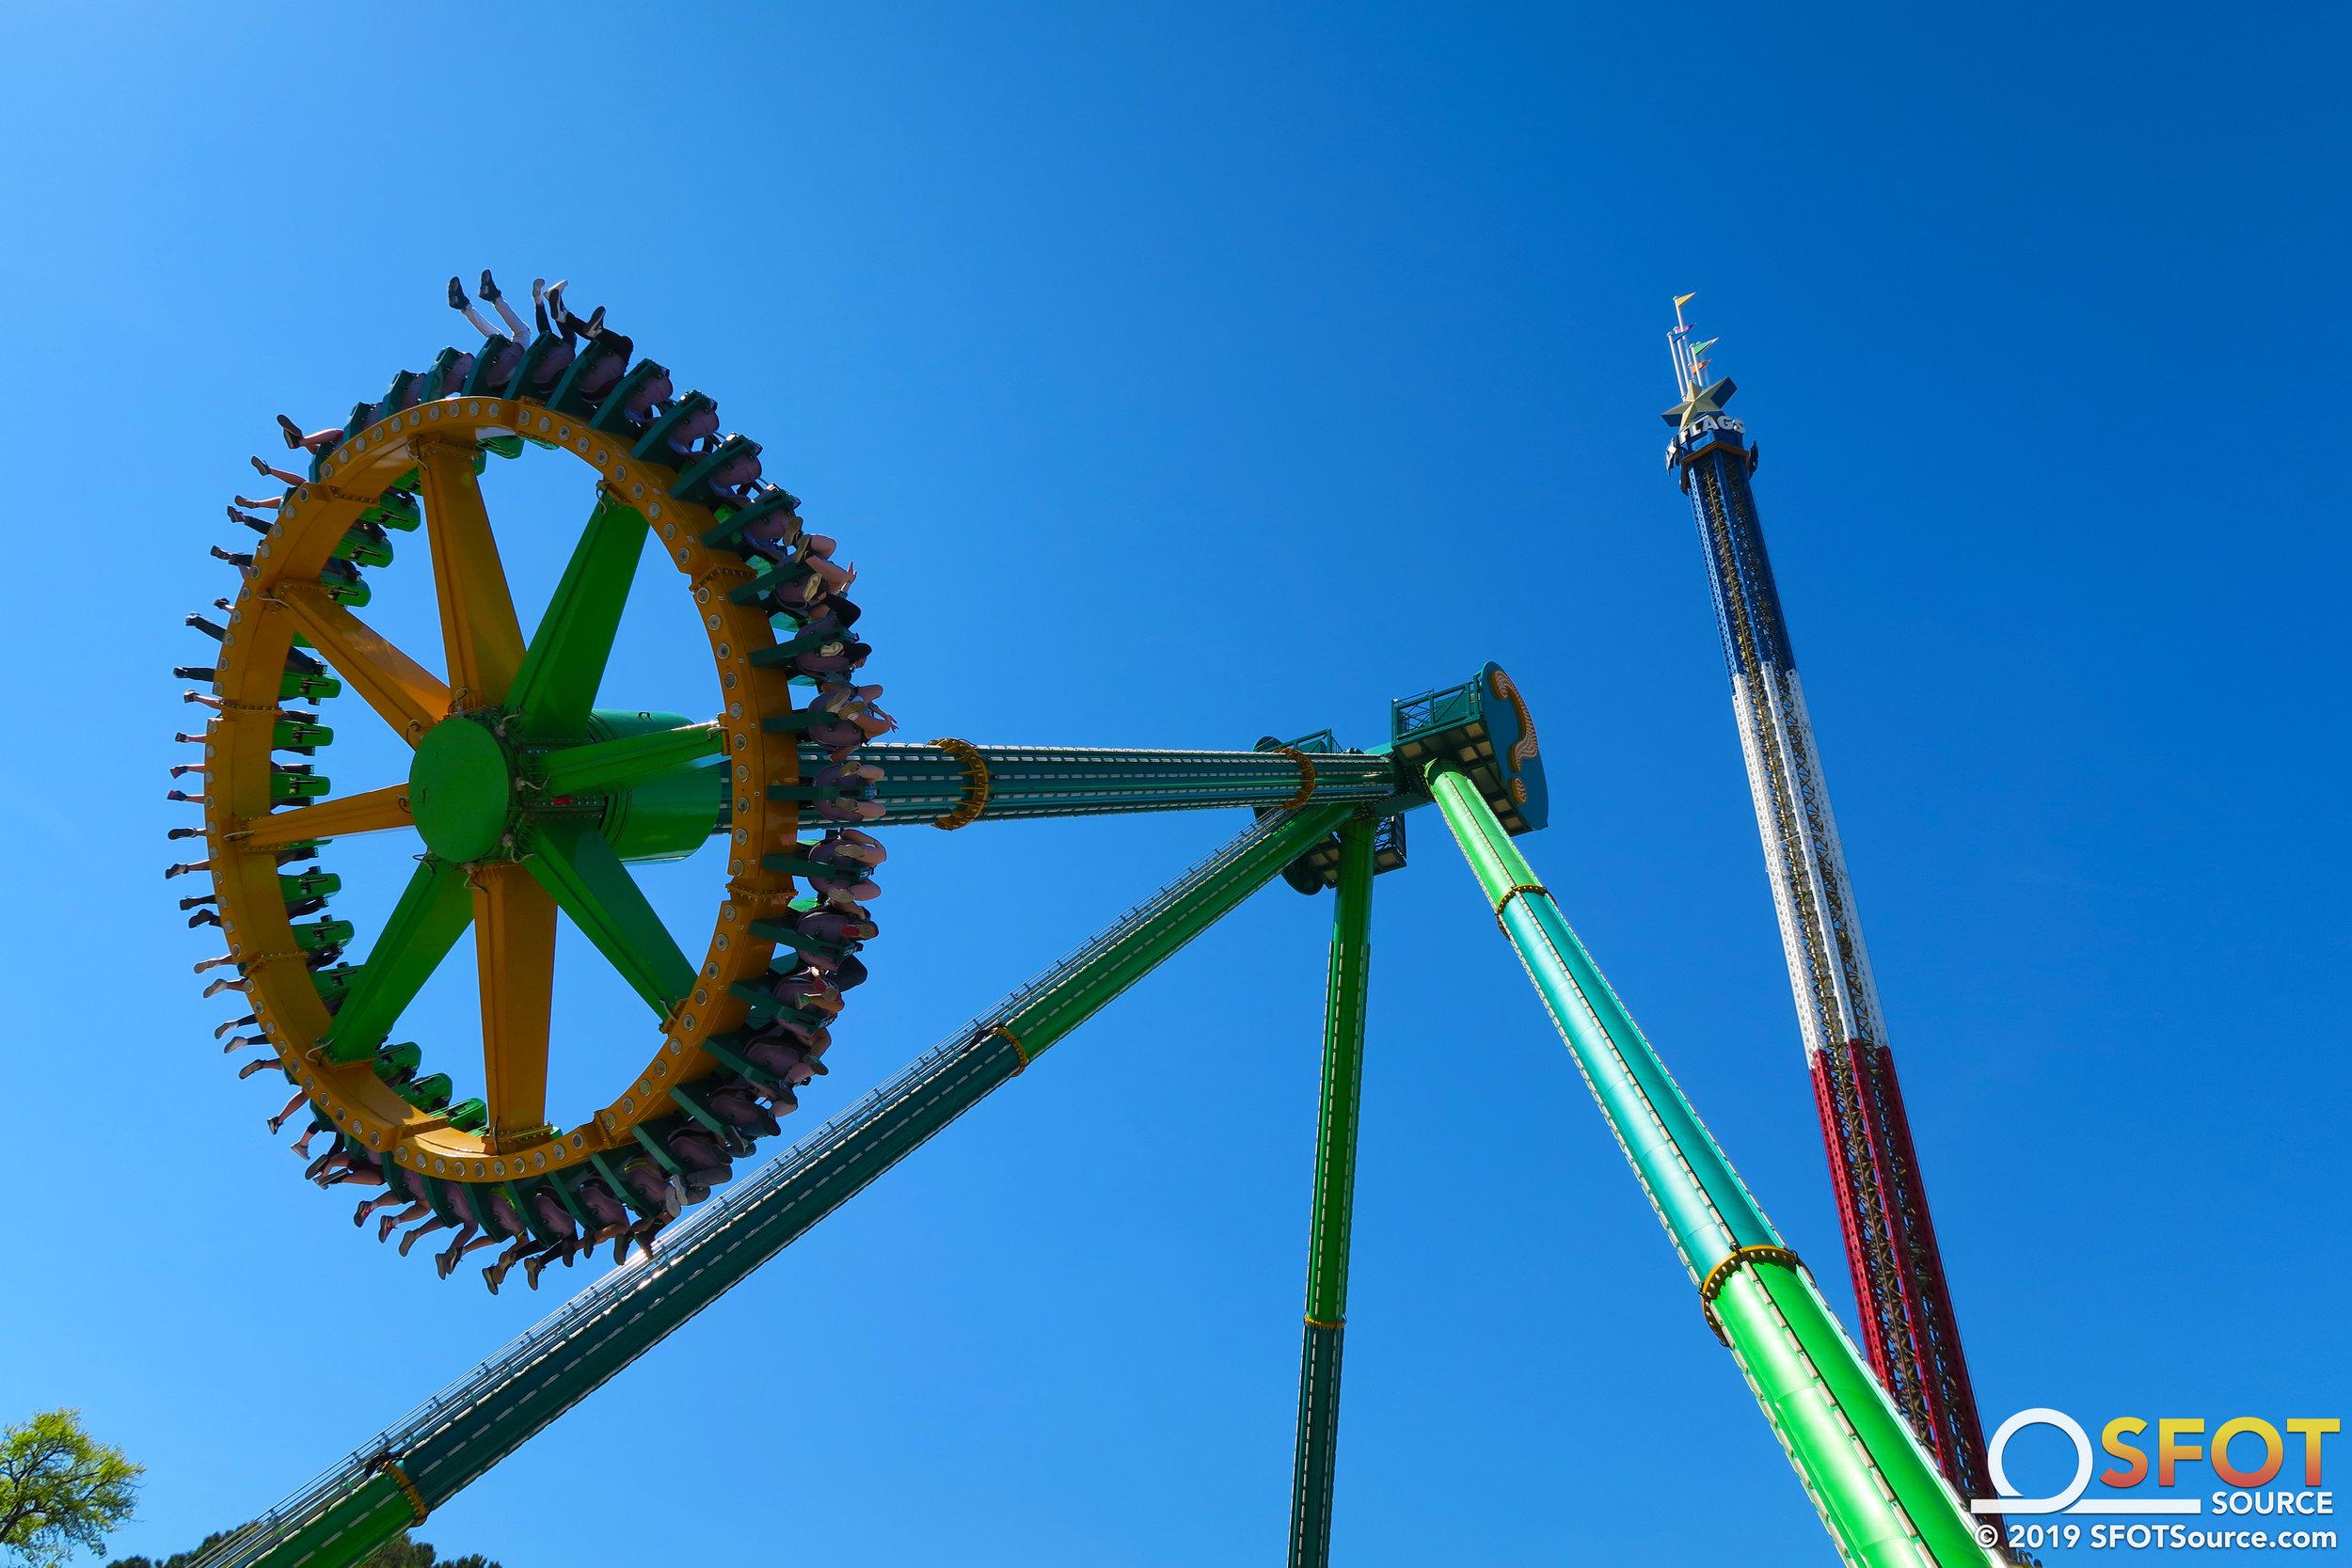 The Riddler Revenge stands at 147 feet tall.